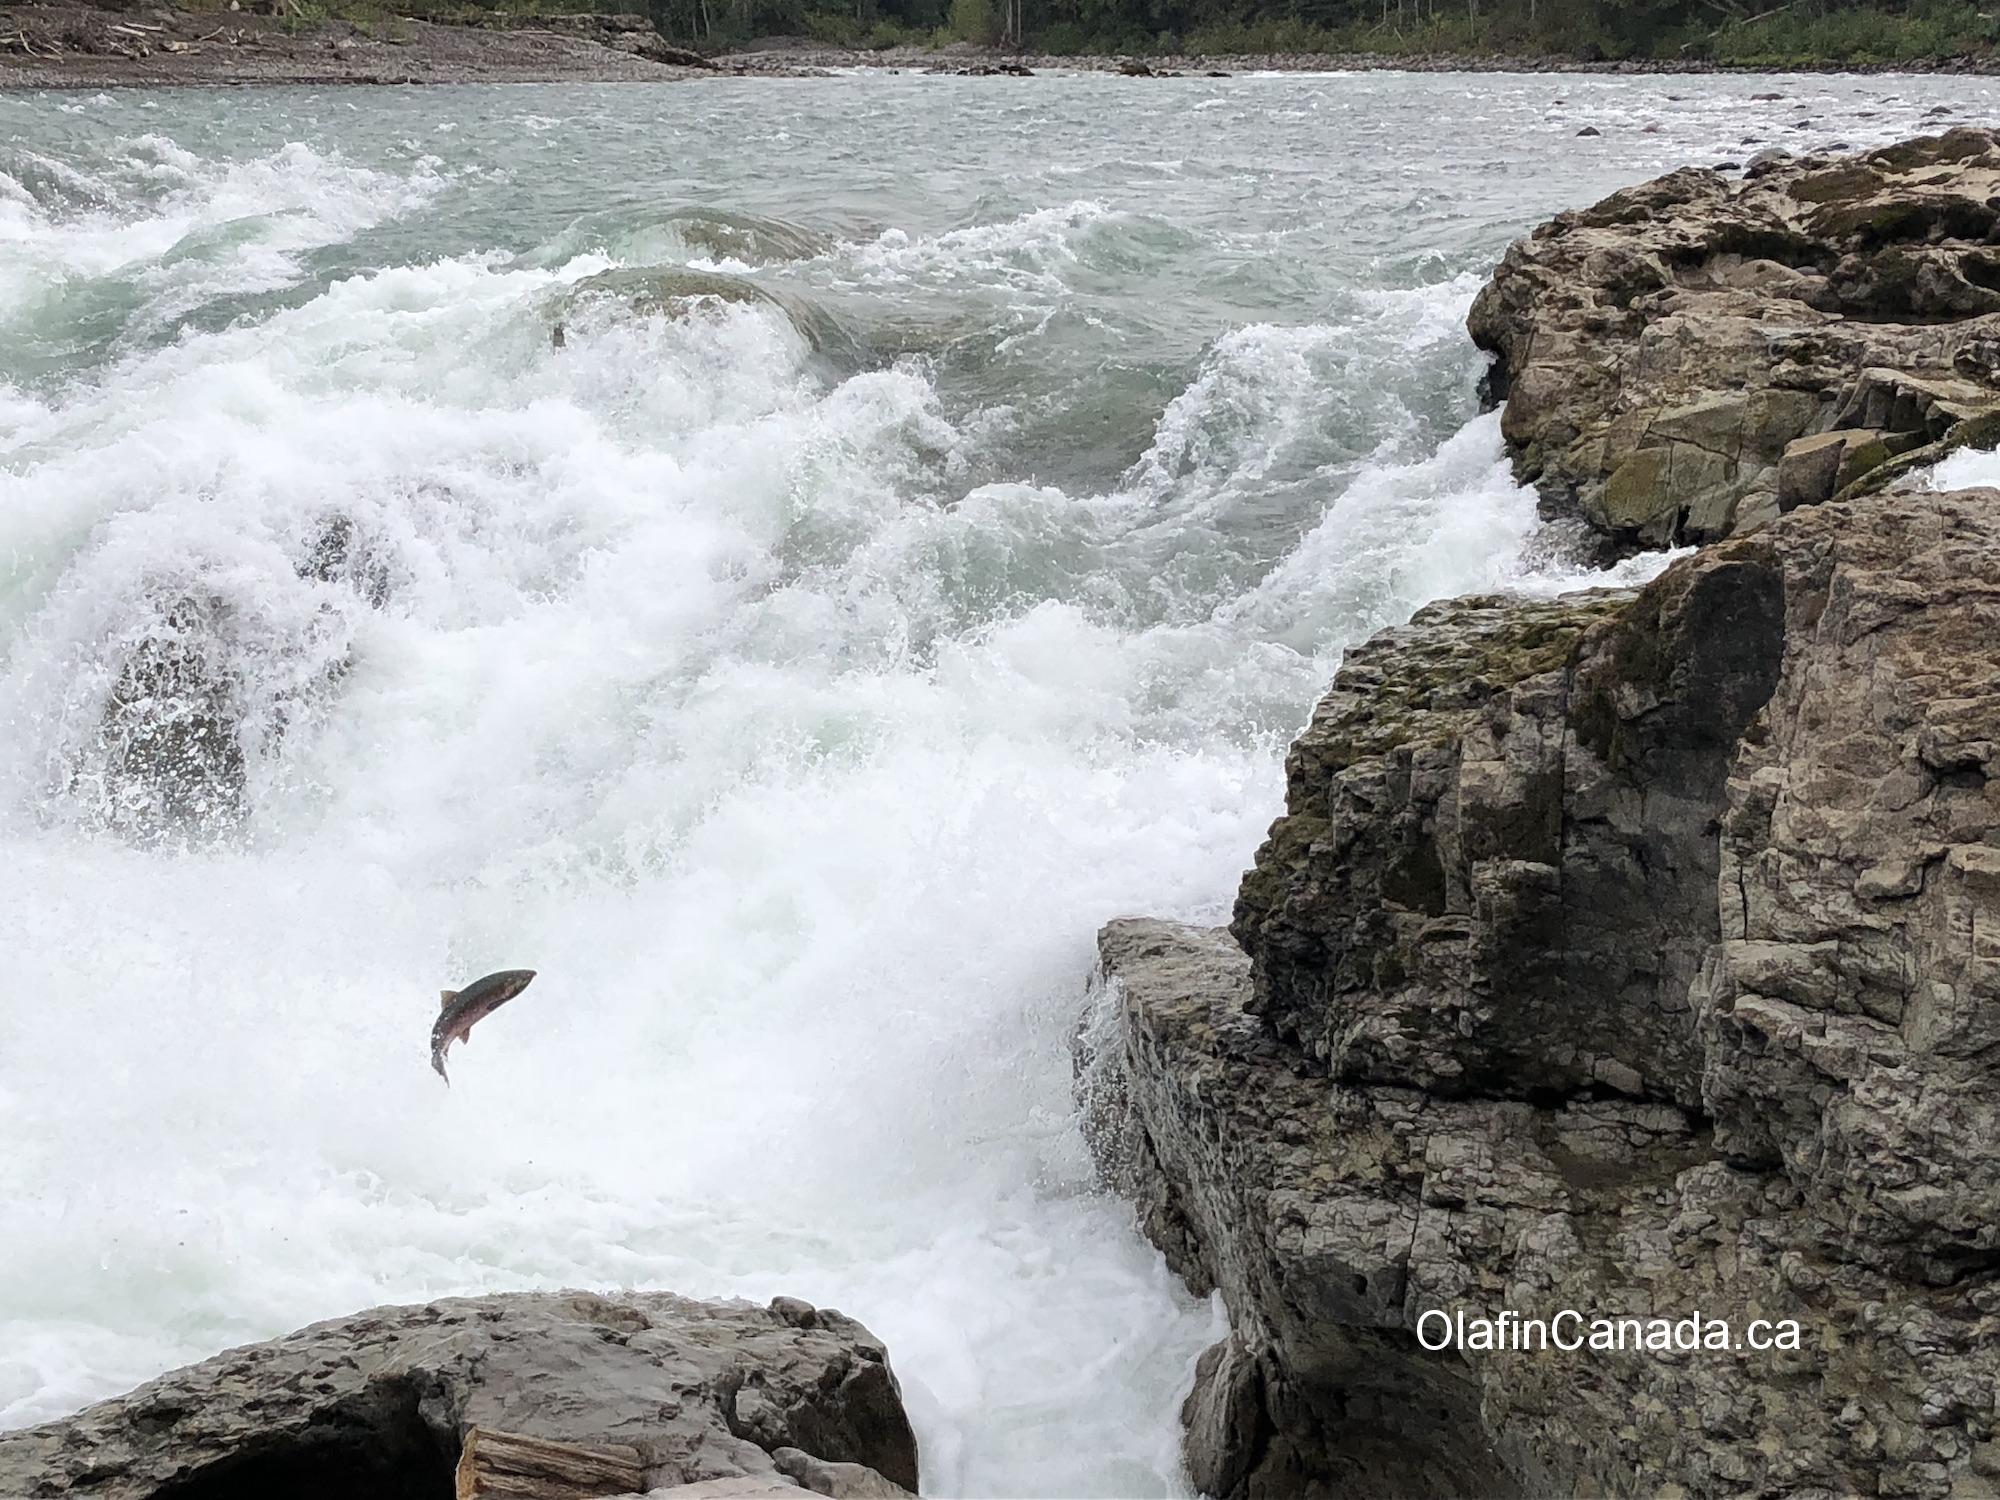 Jumping salmon in Bulkley River at Moricetown #olafincanada #britishcolumbia #discoverbc #wildlife #moricetown #salmon